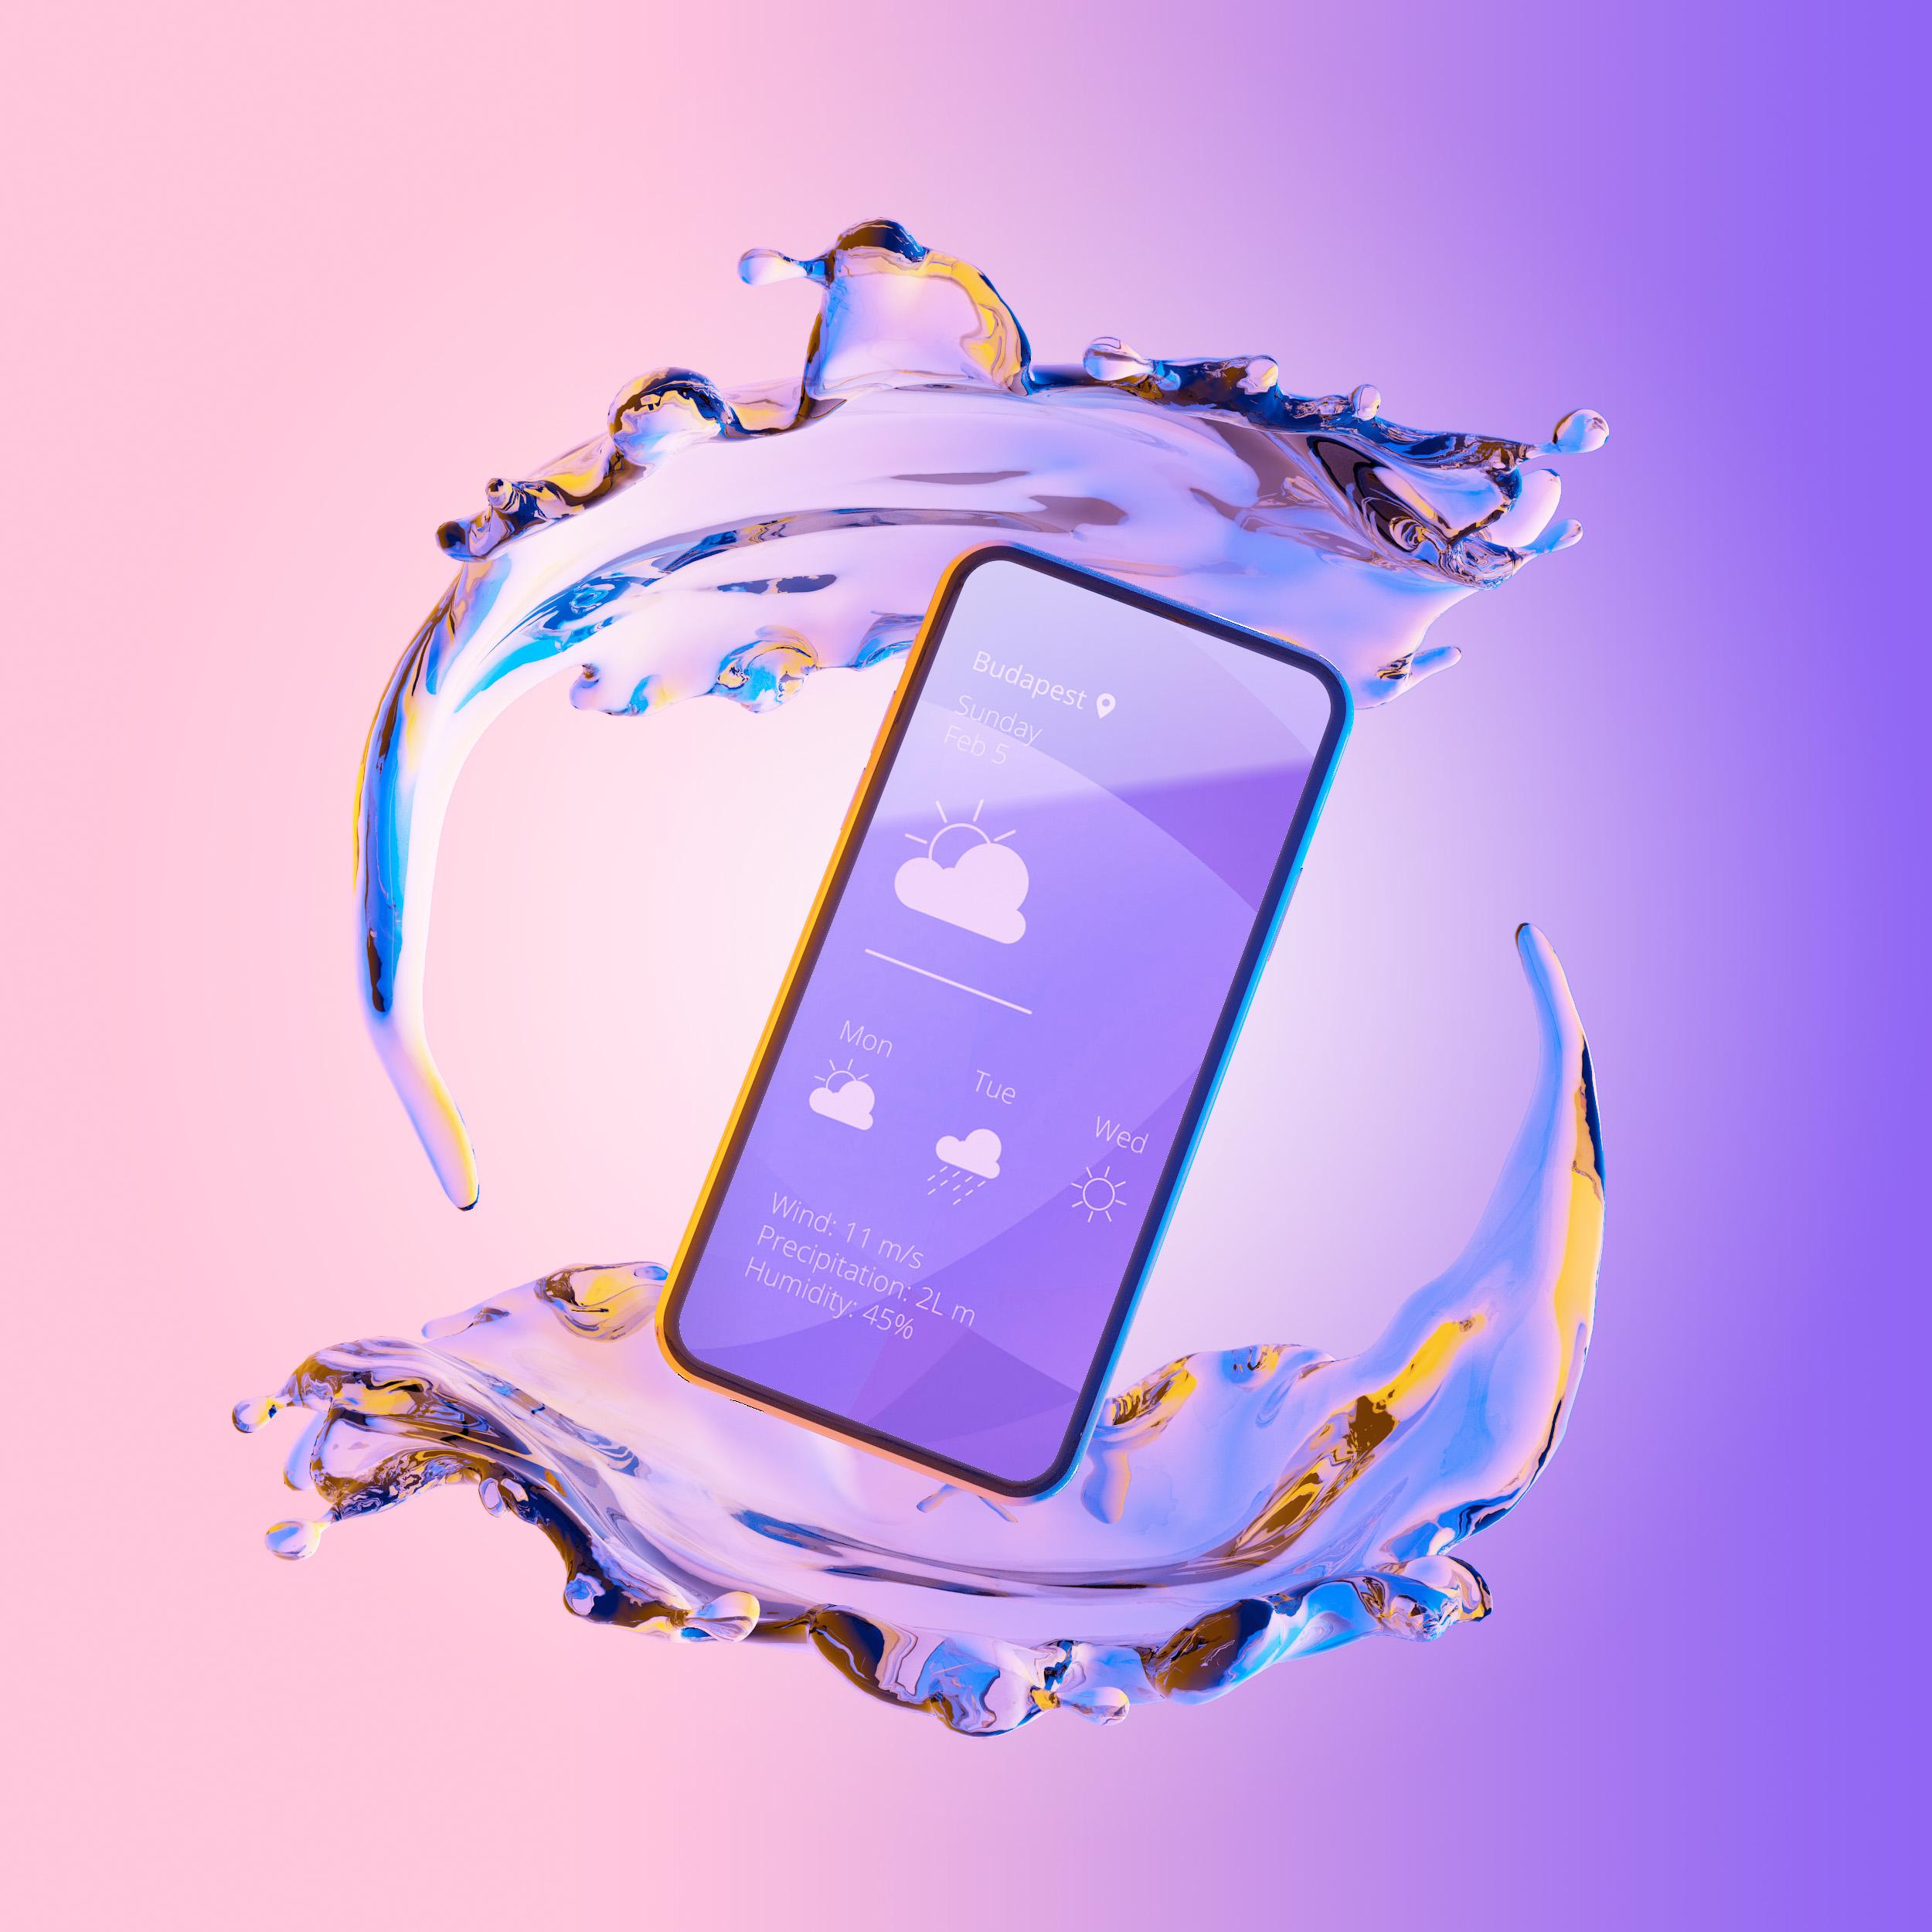 Free iPhone Phone PSD Mockup on Liquid